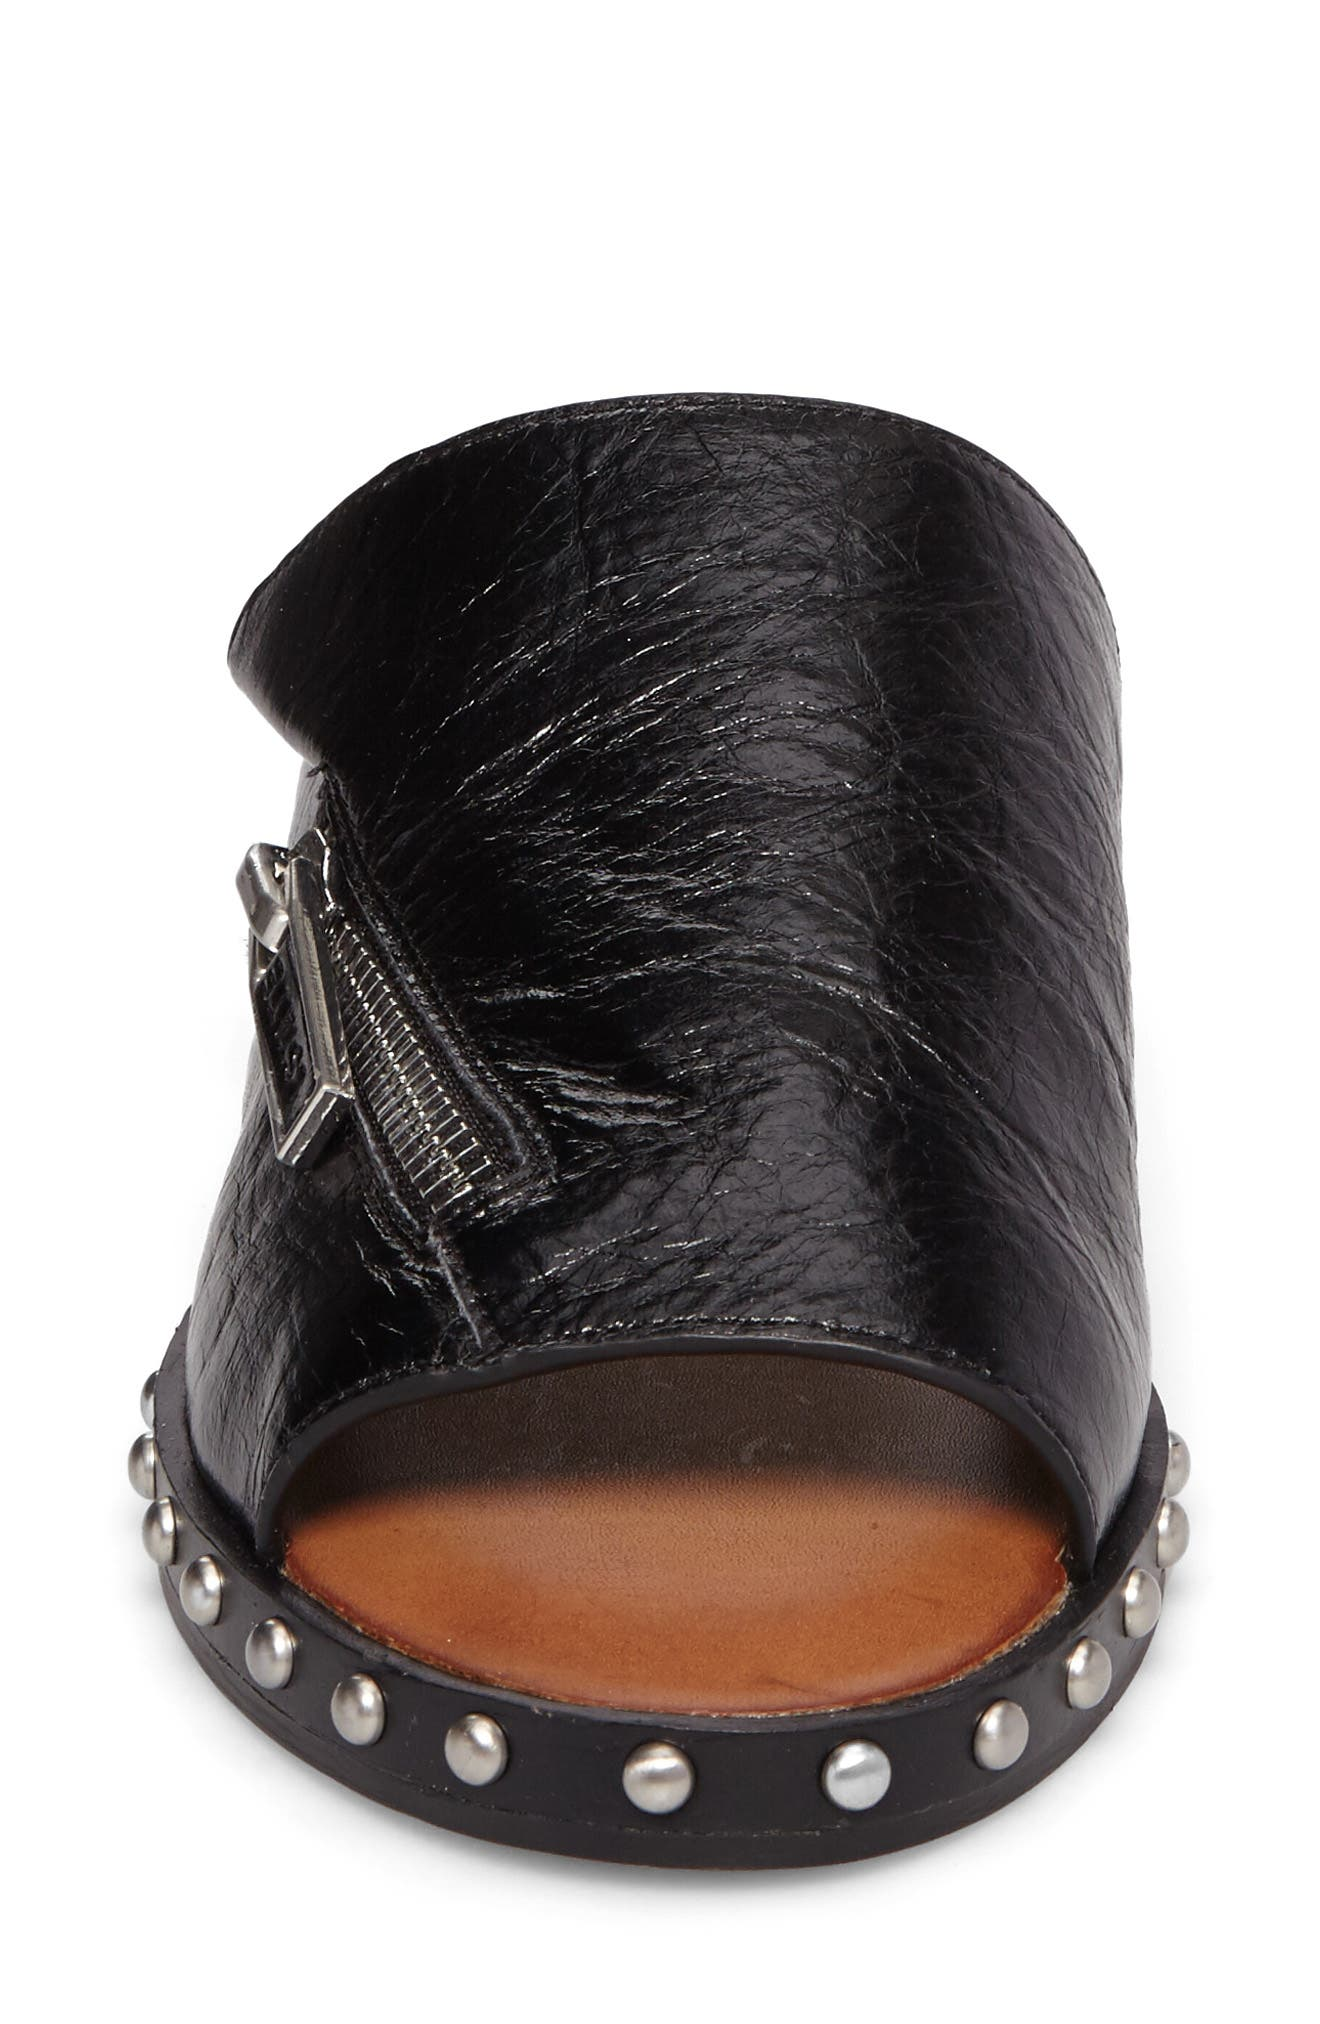 Cadwyn Slide Sandal,                             Alternate thumbnail 4, color,                             Black Leather